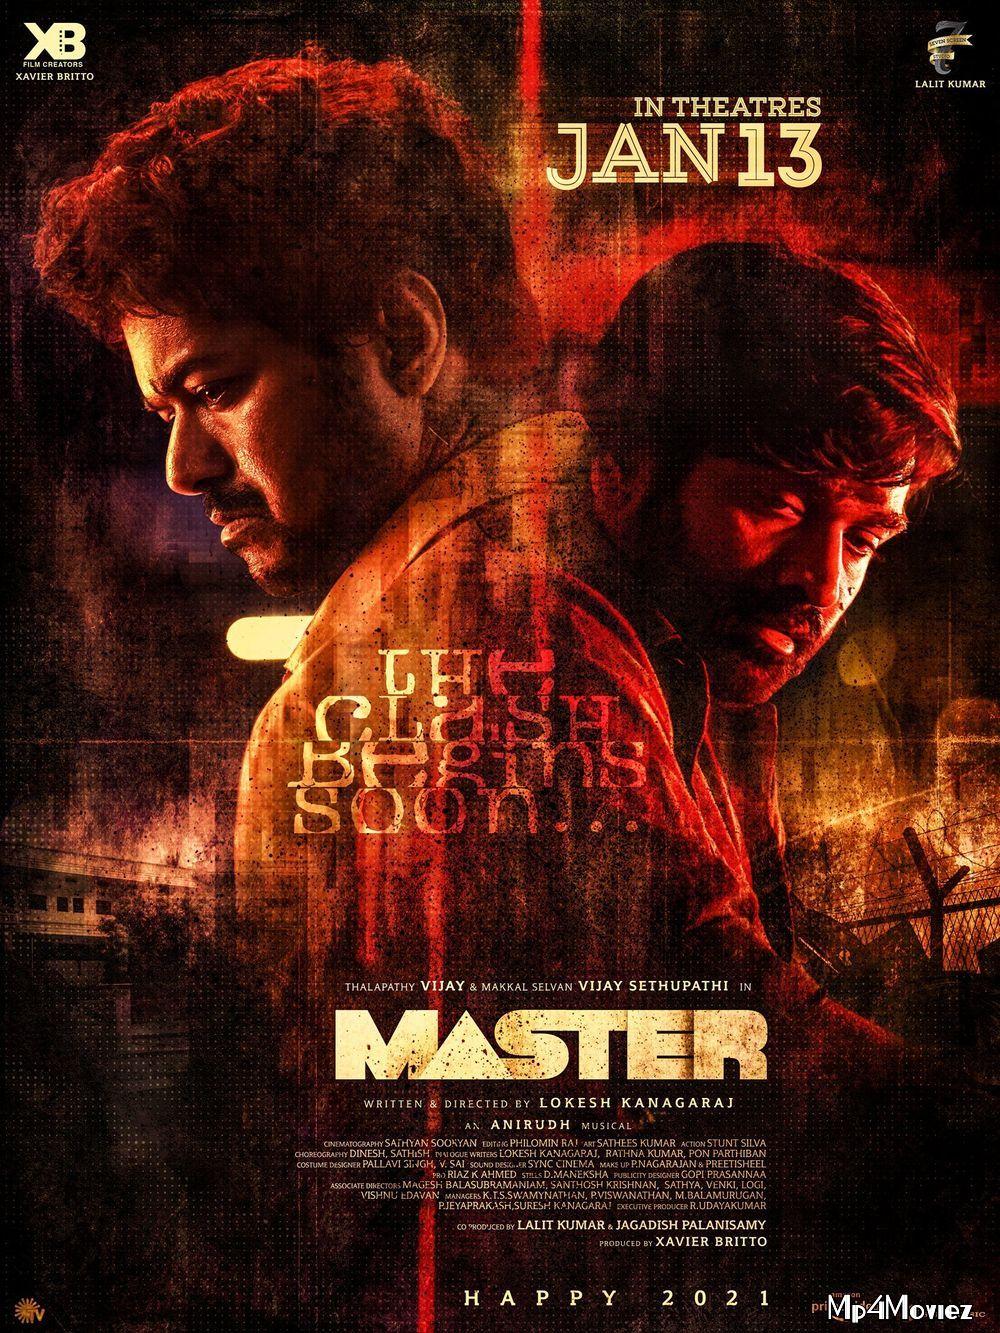 Master (2021) Hindi Dubbed Movie HDRip 720p AAC